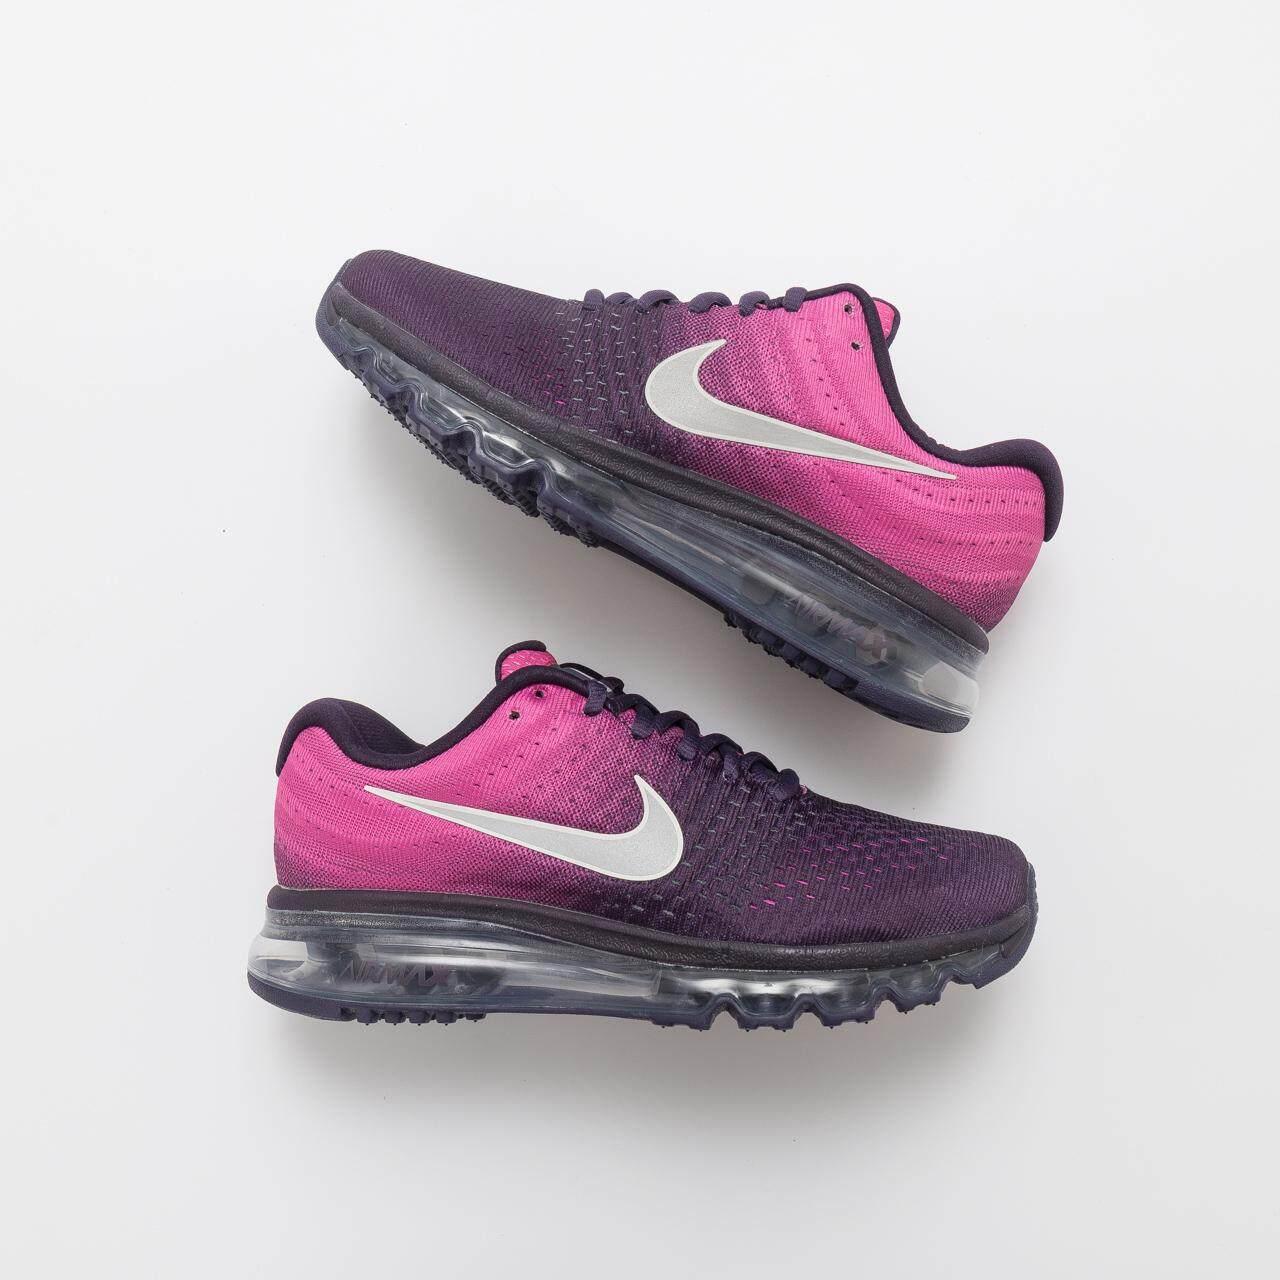 timeless design d20e6 a81ab ... store nike girls air max 2017 gs running shoes gg8 purple dynasty  851623 500 intl de961